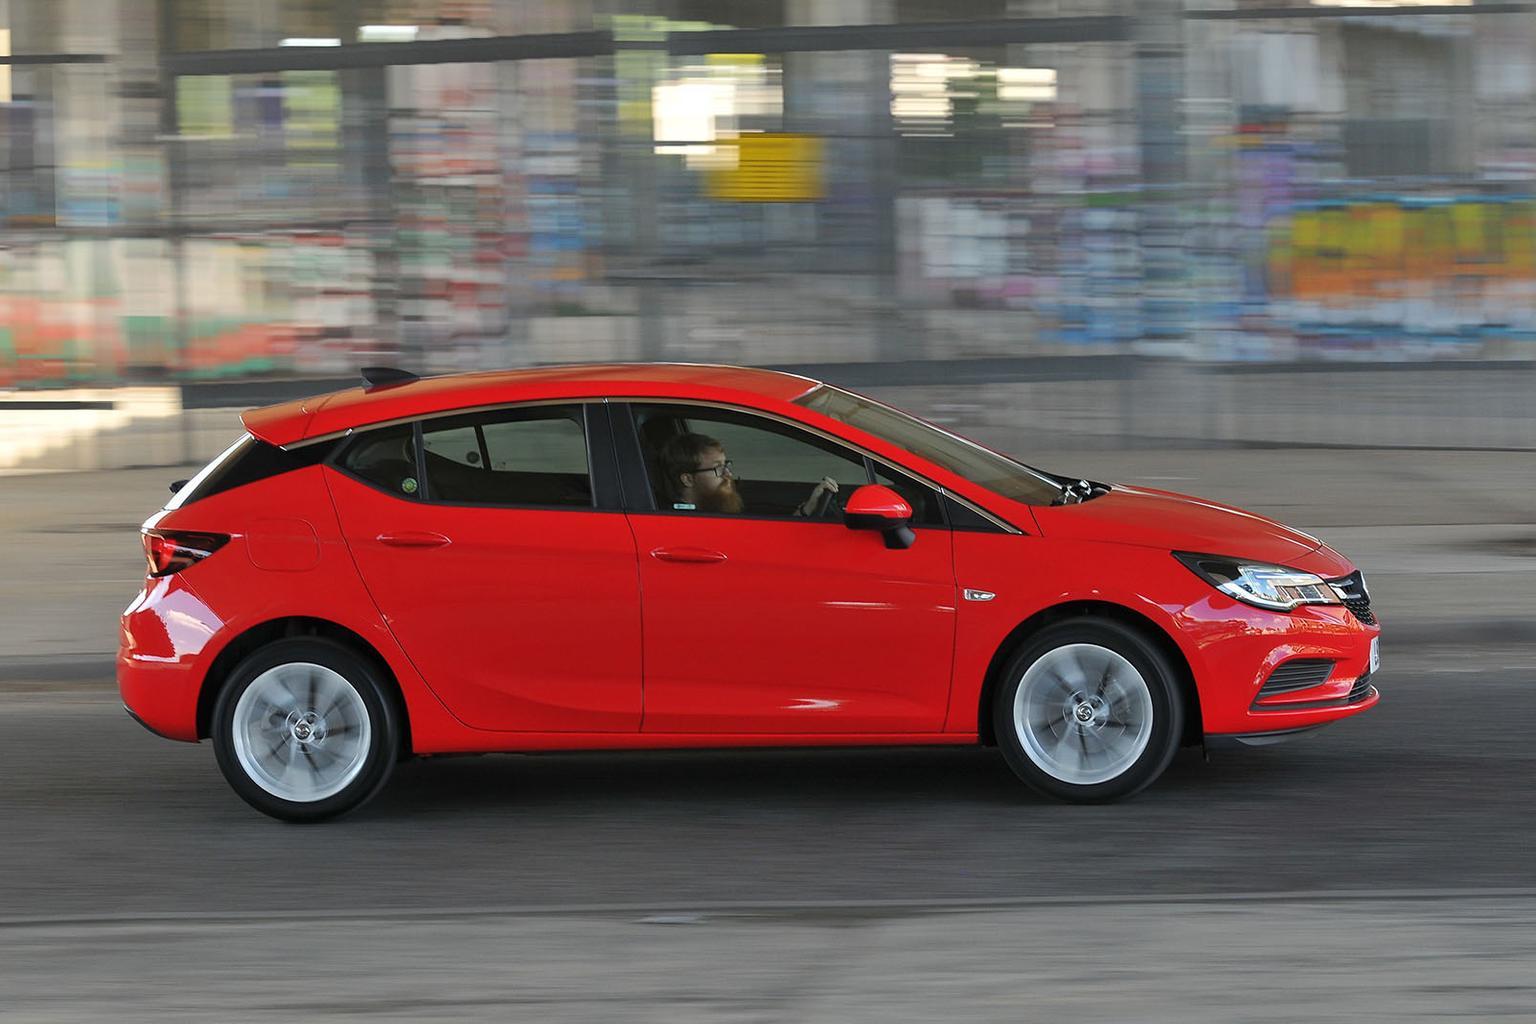 Skoda Octavia vs Vauxhall Astra